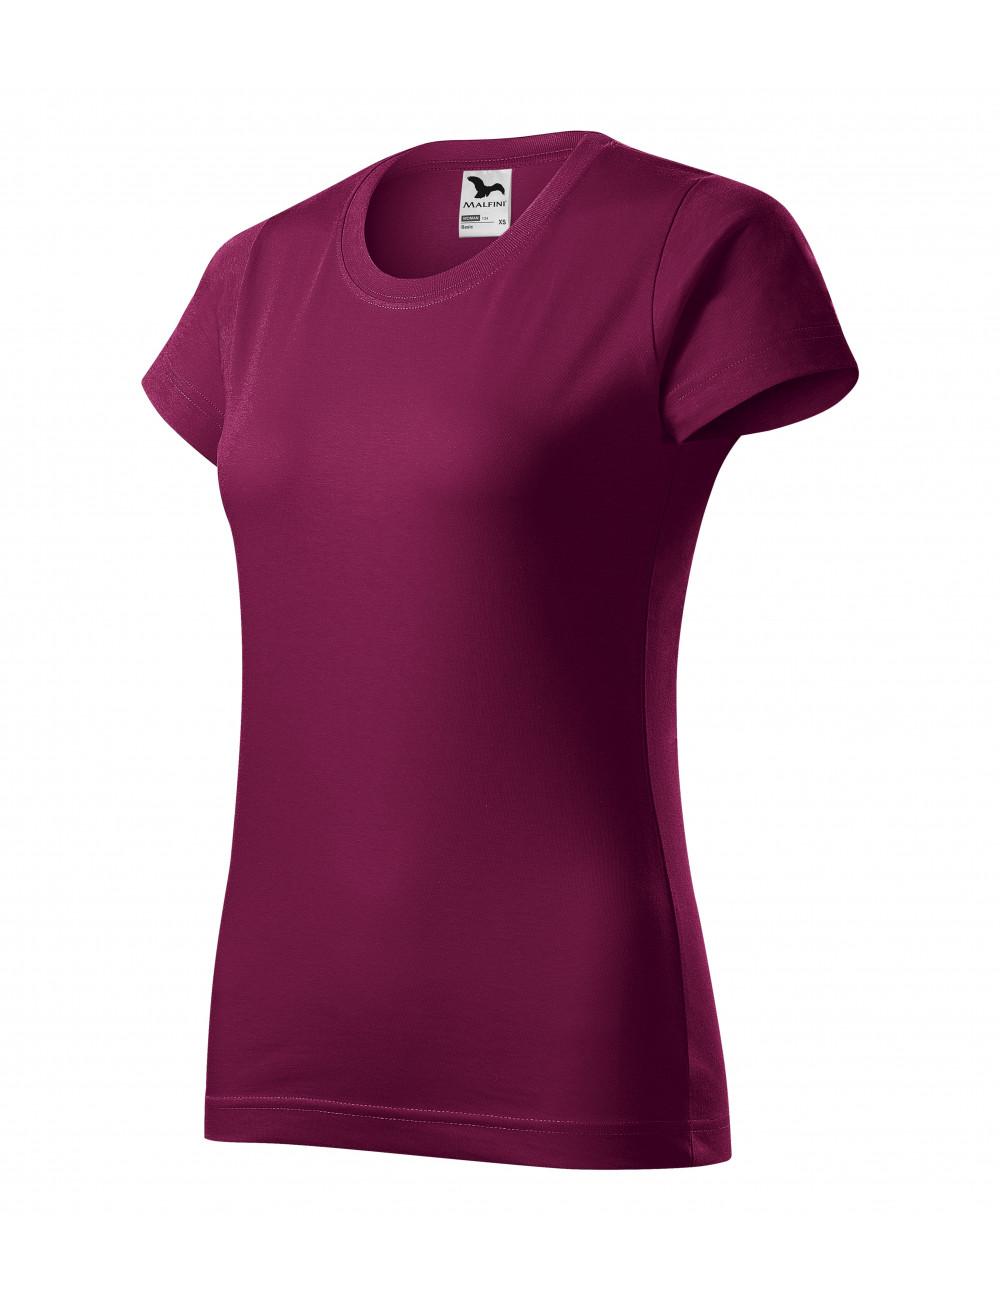 Adler MALFINI Koszulka damska Basic 134 uksjowy